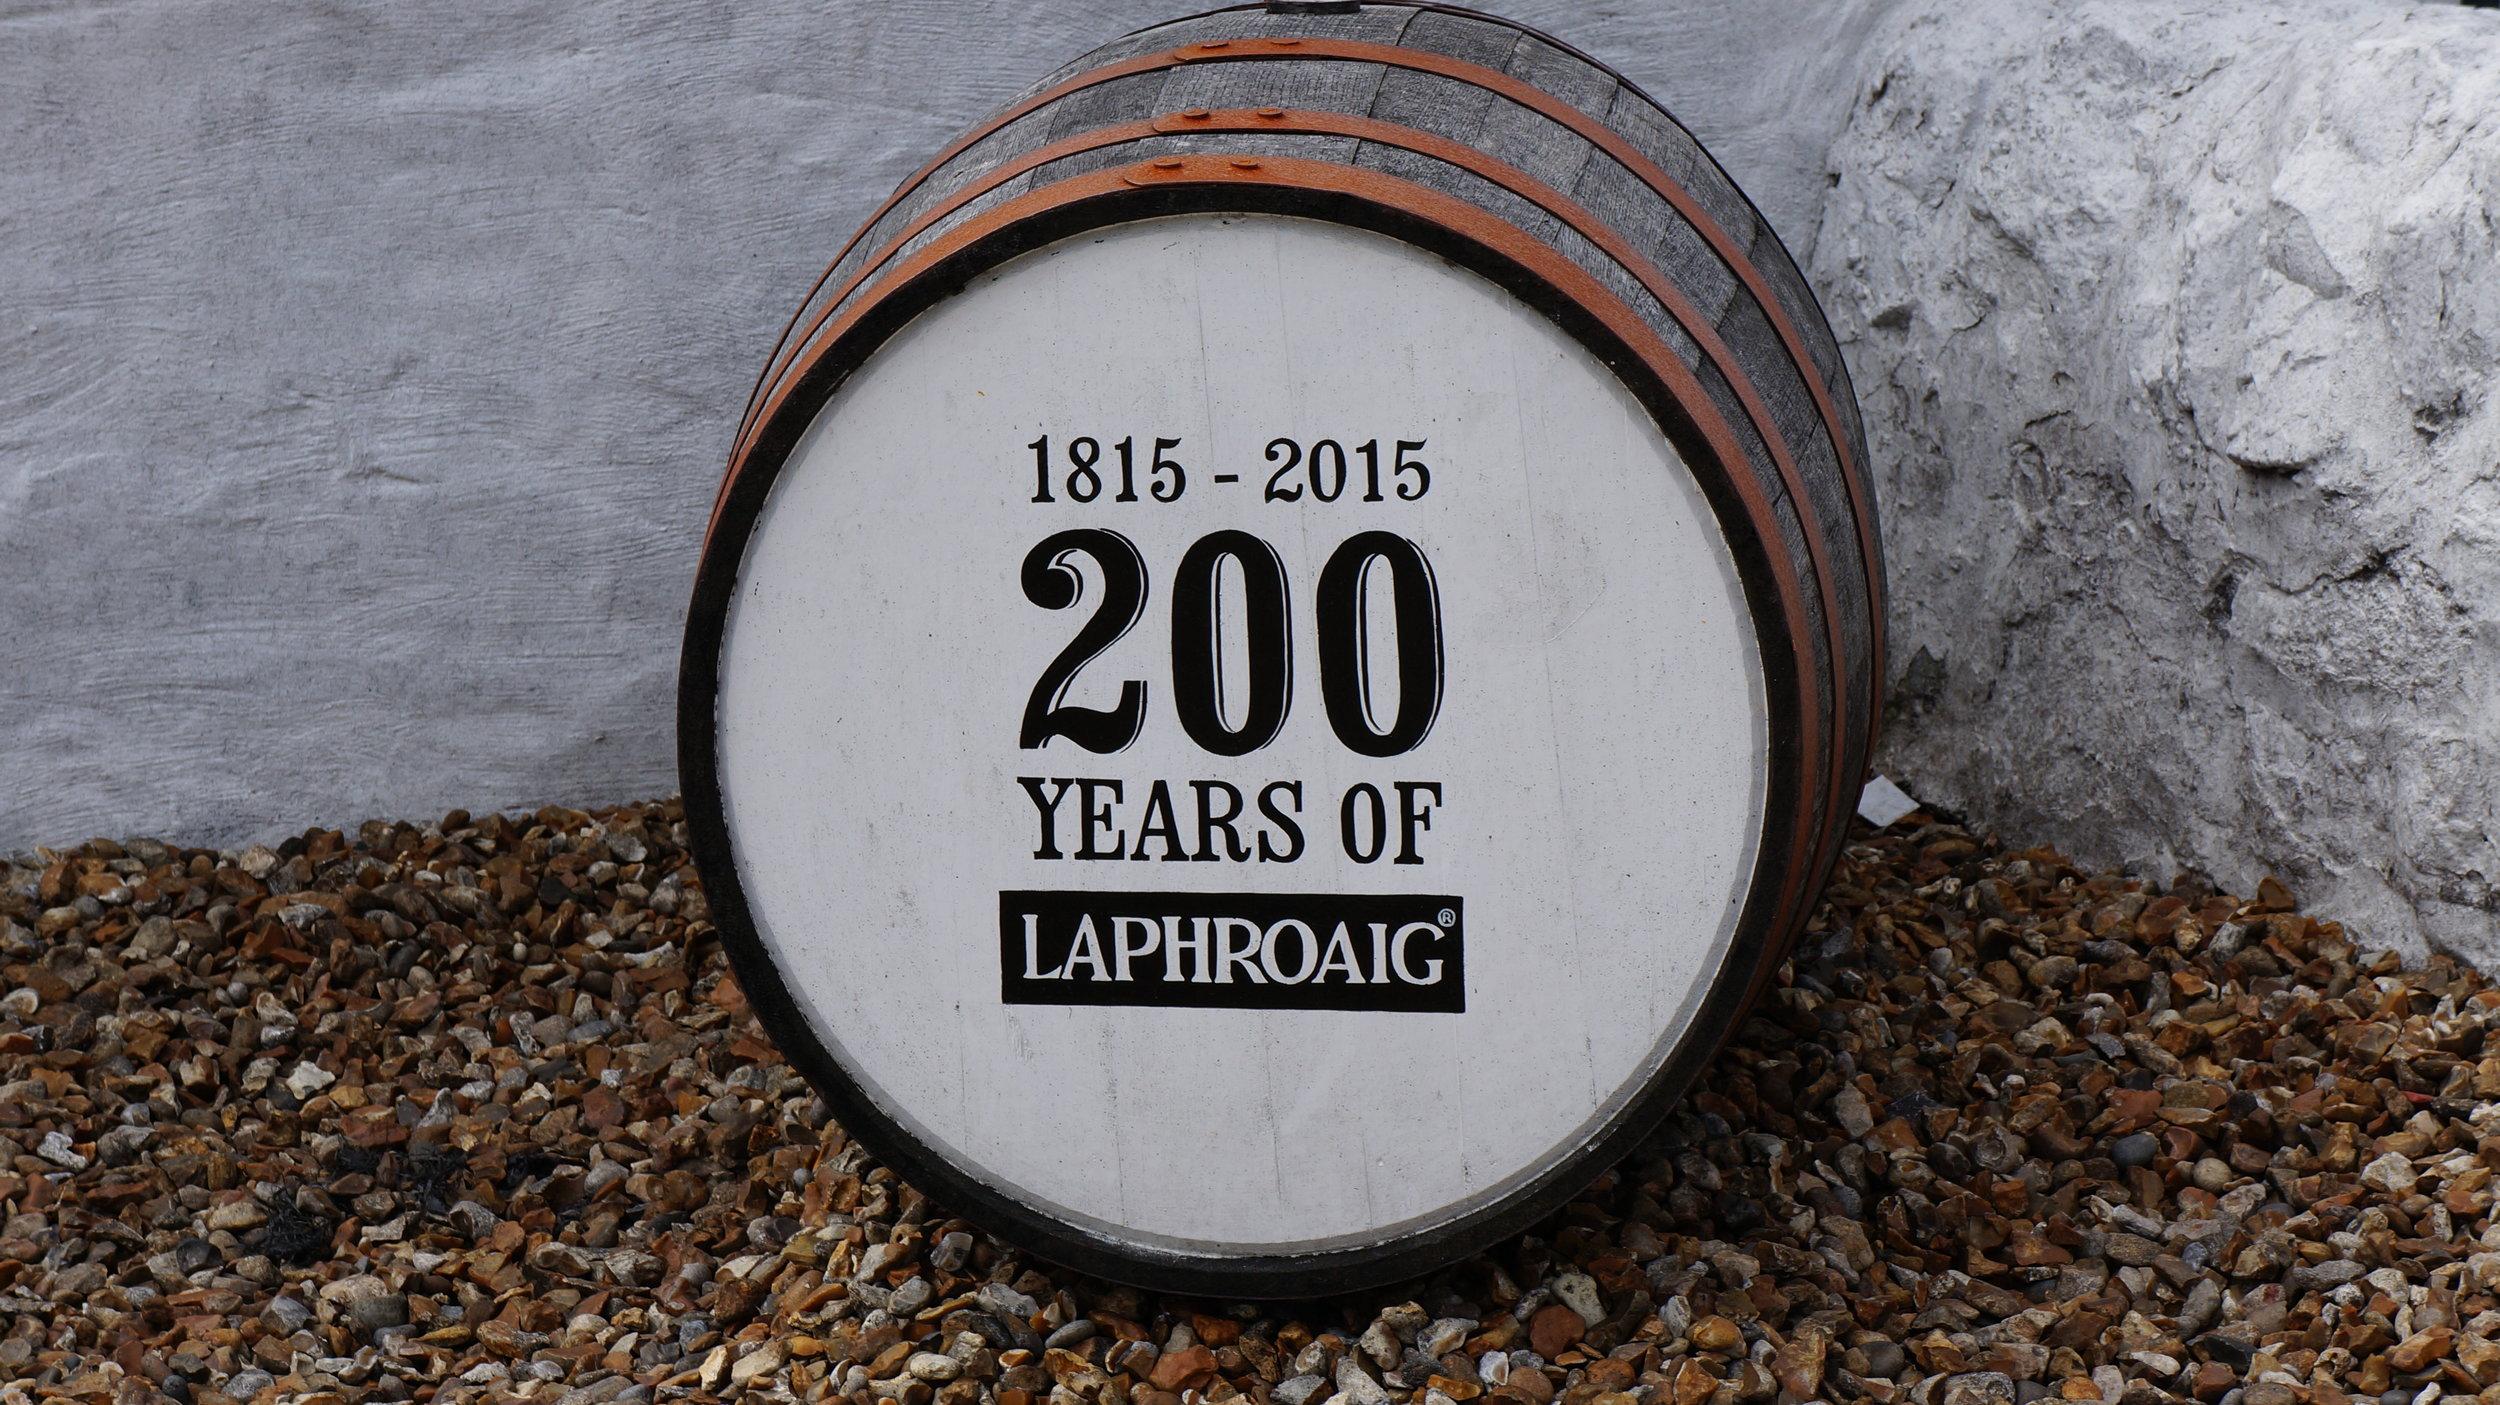 Laphroaig 200 Years